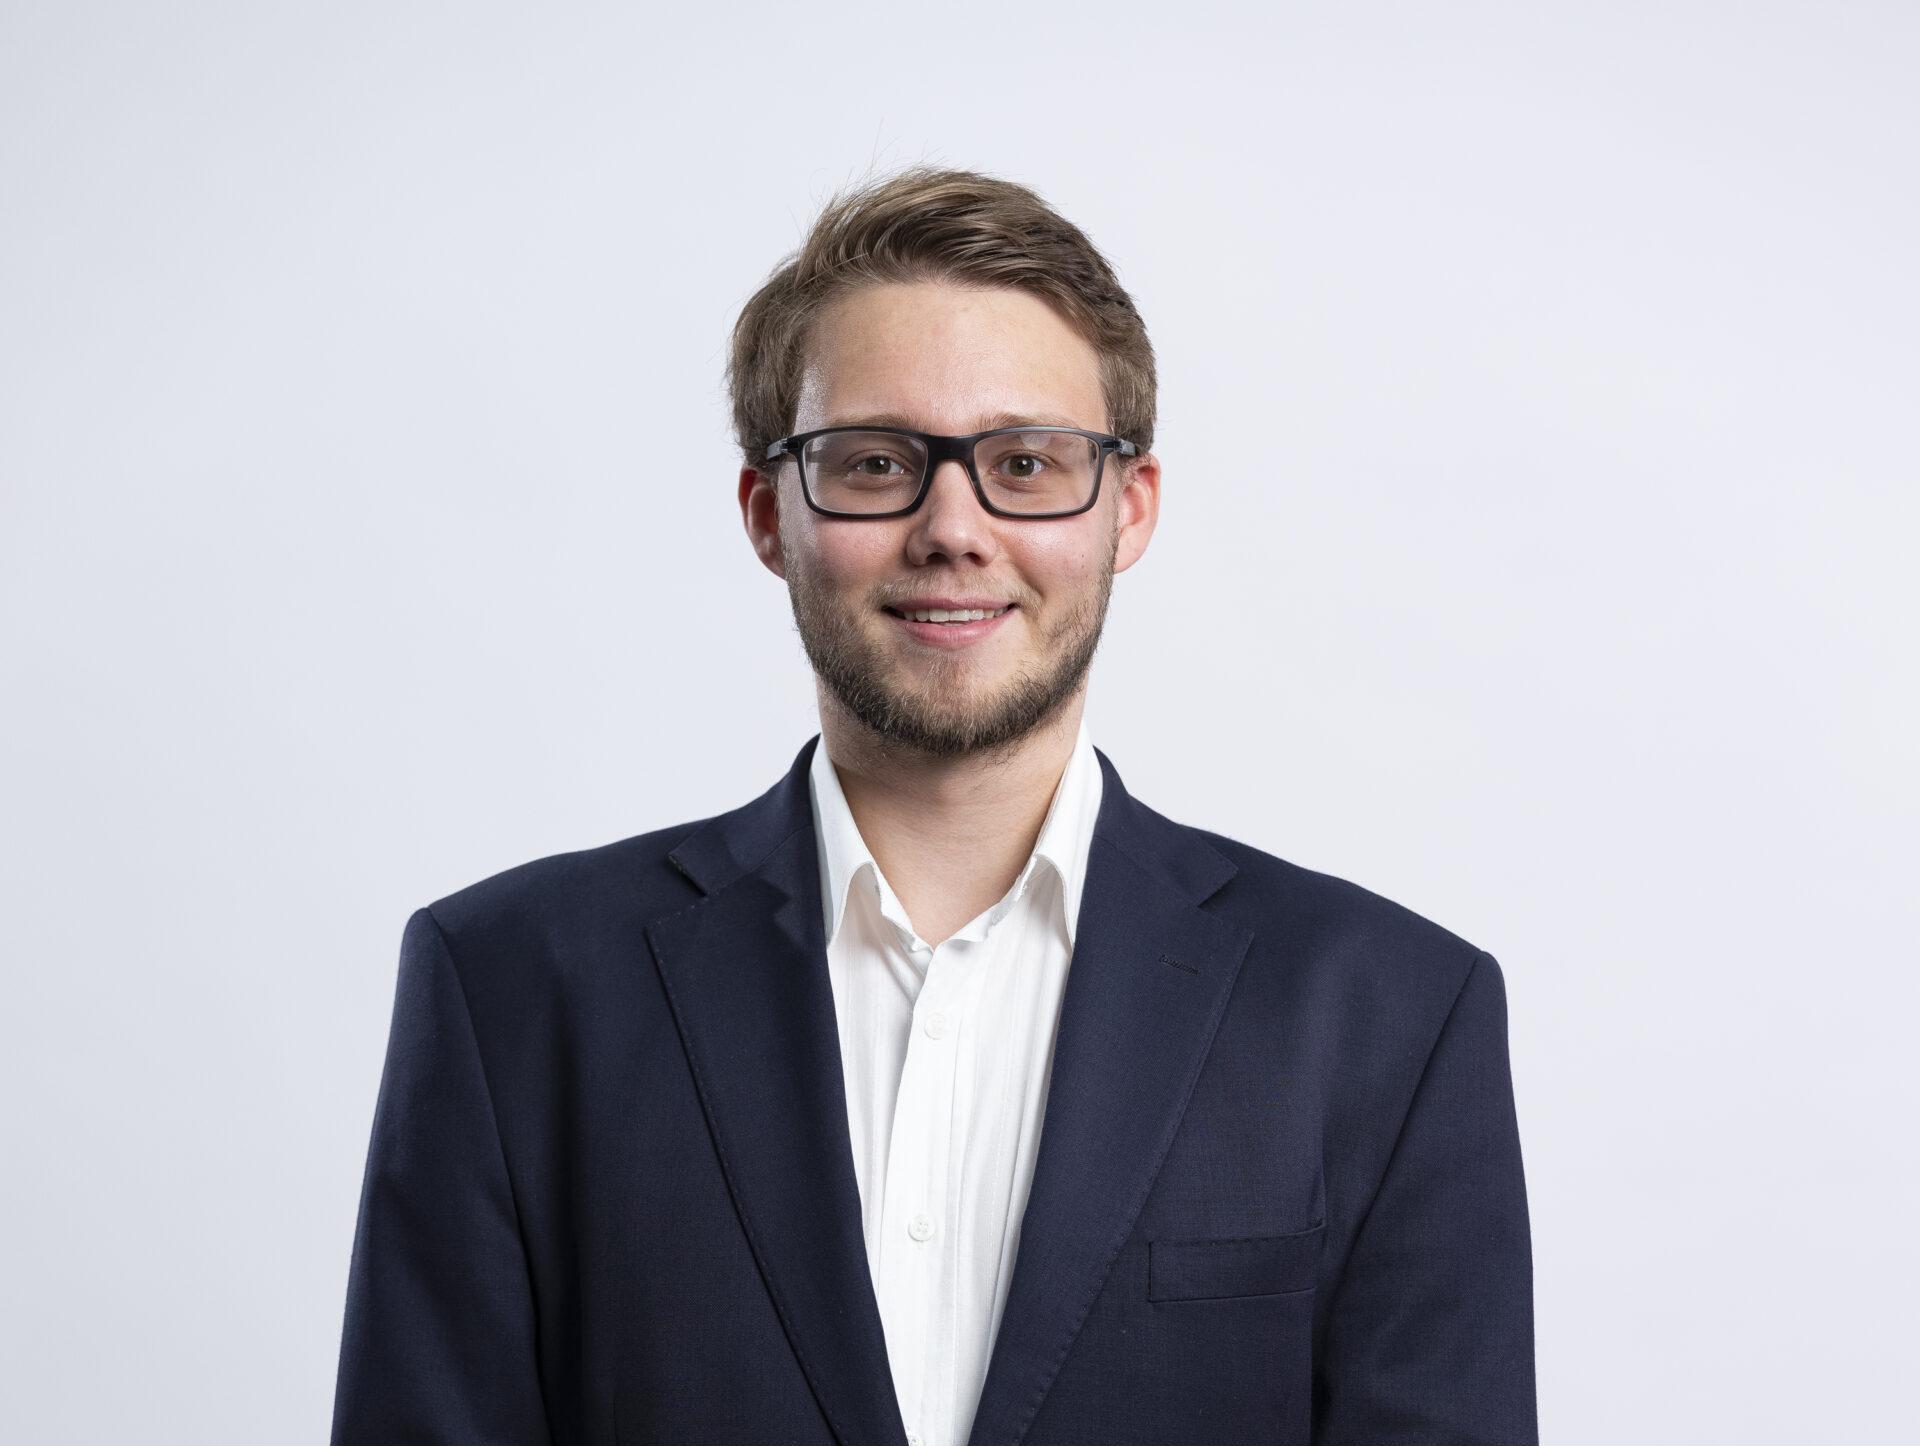 Daniel Menhart